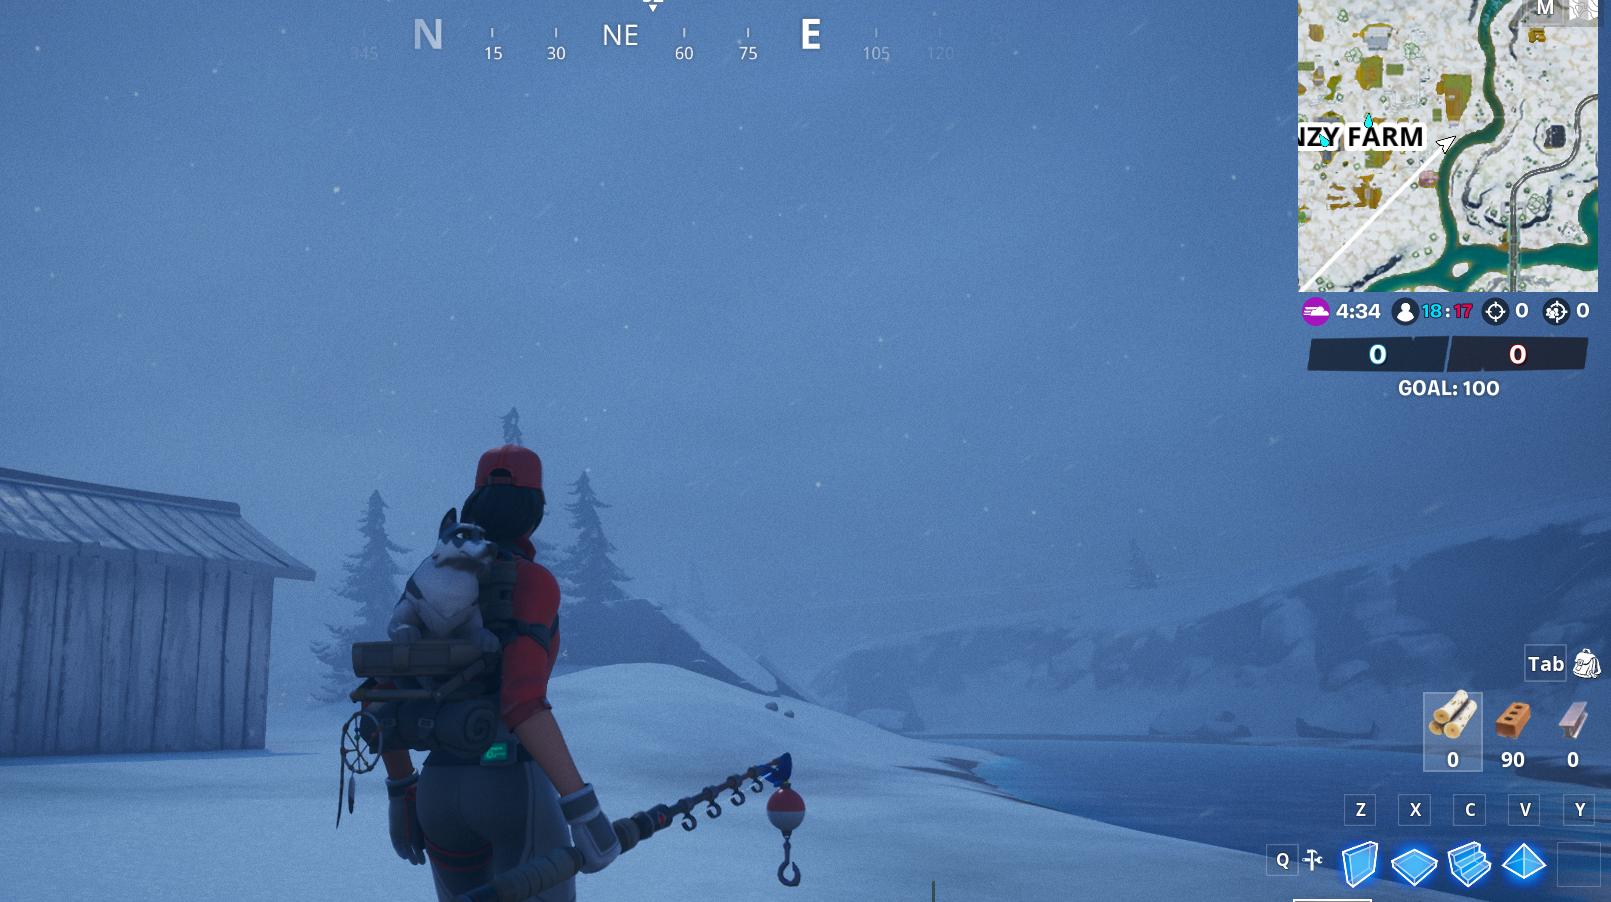 Fortnite Has Blizzards Now